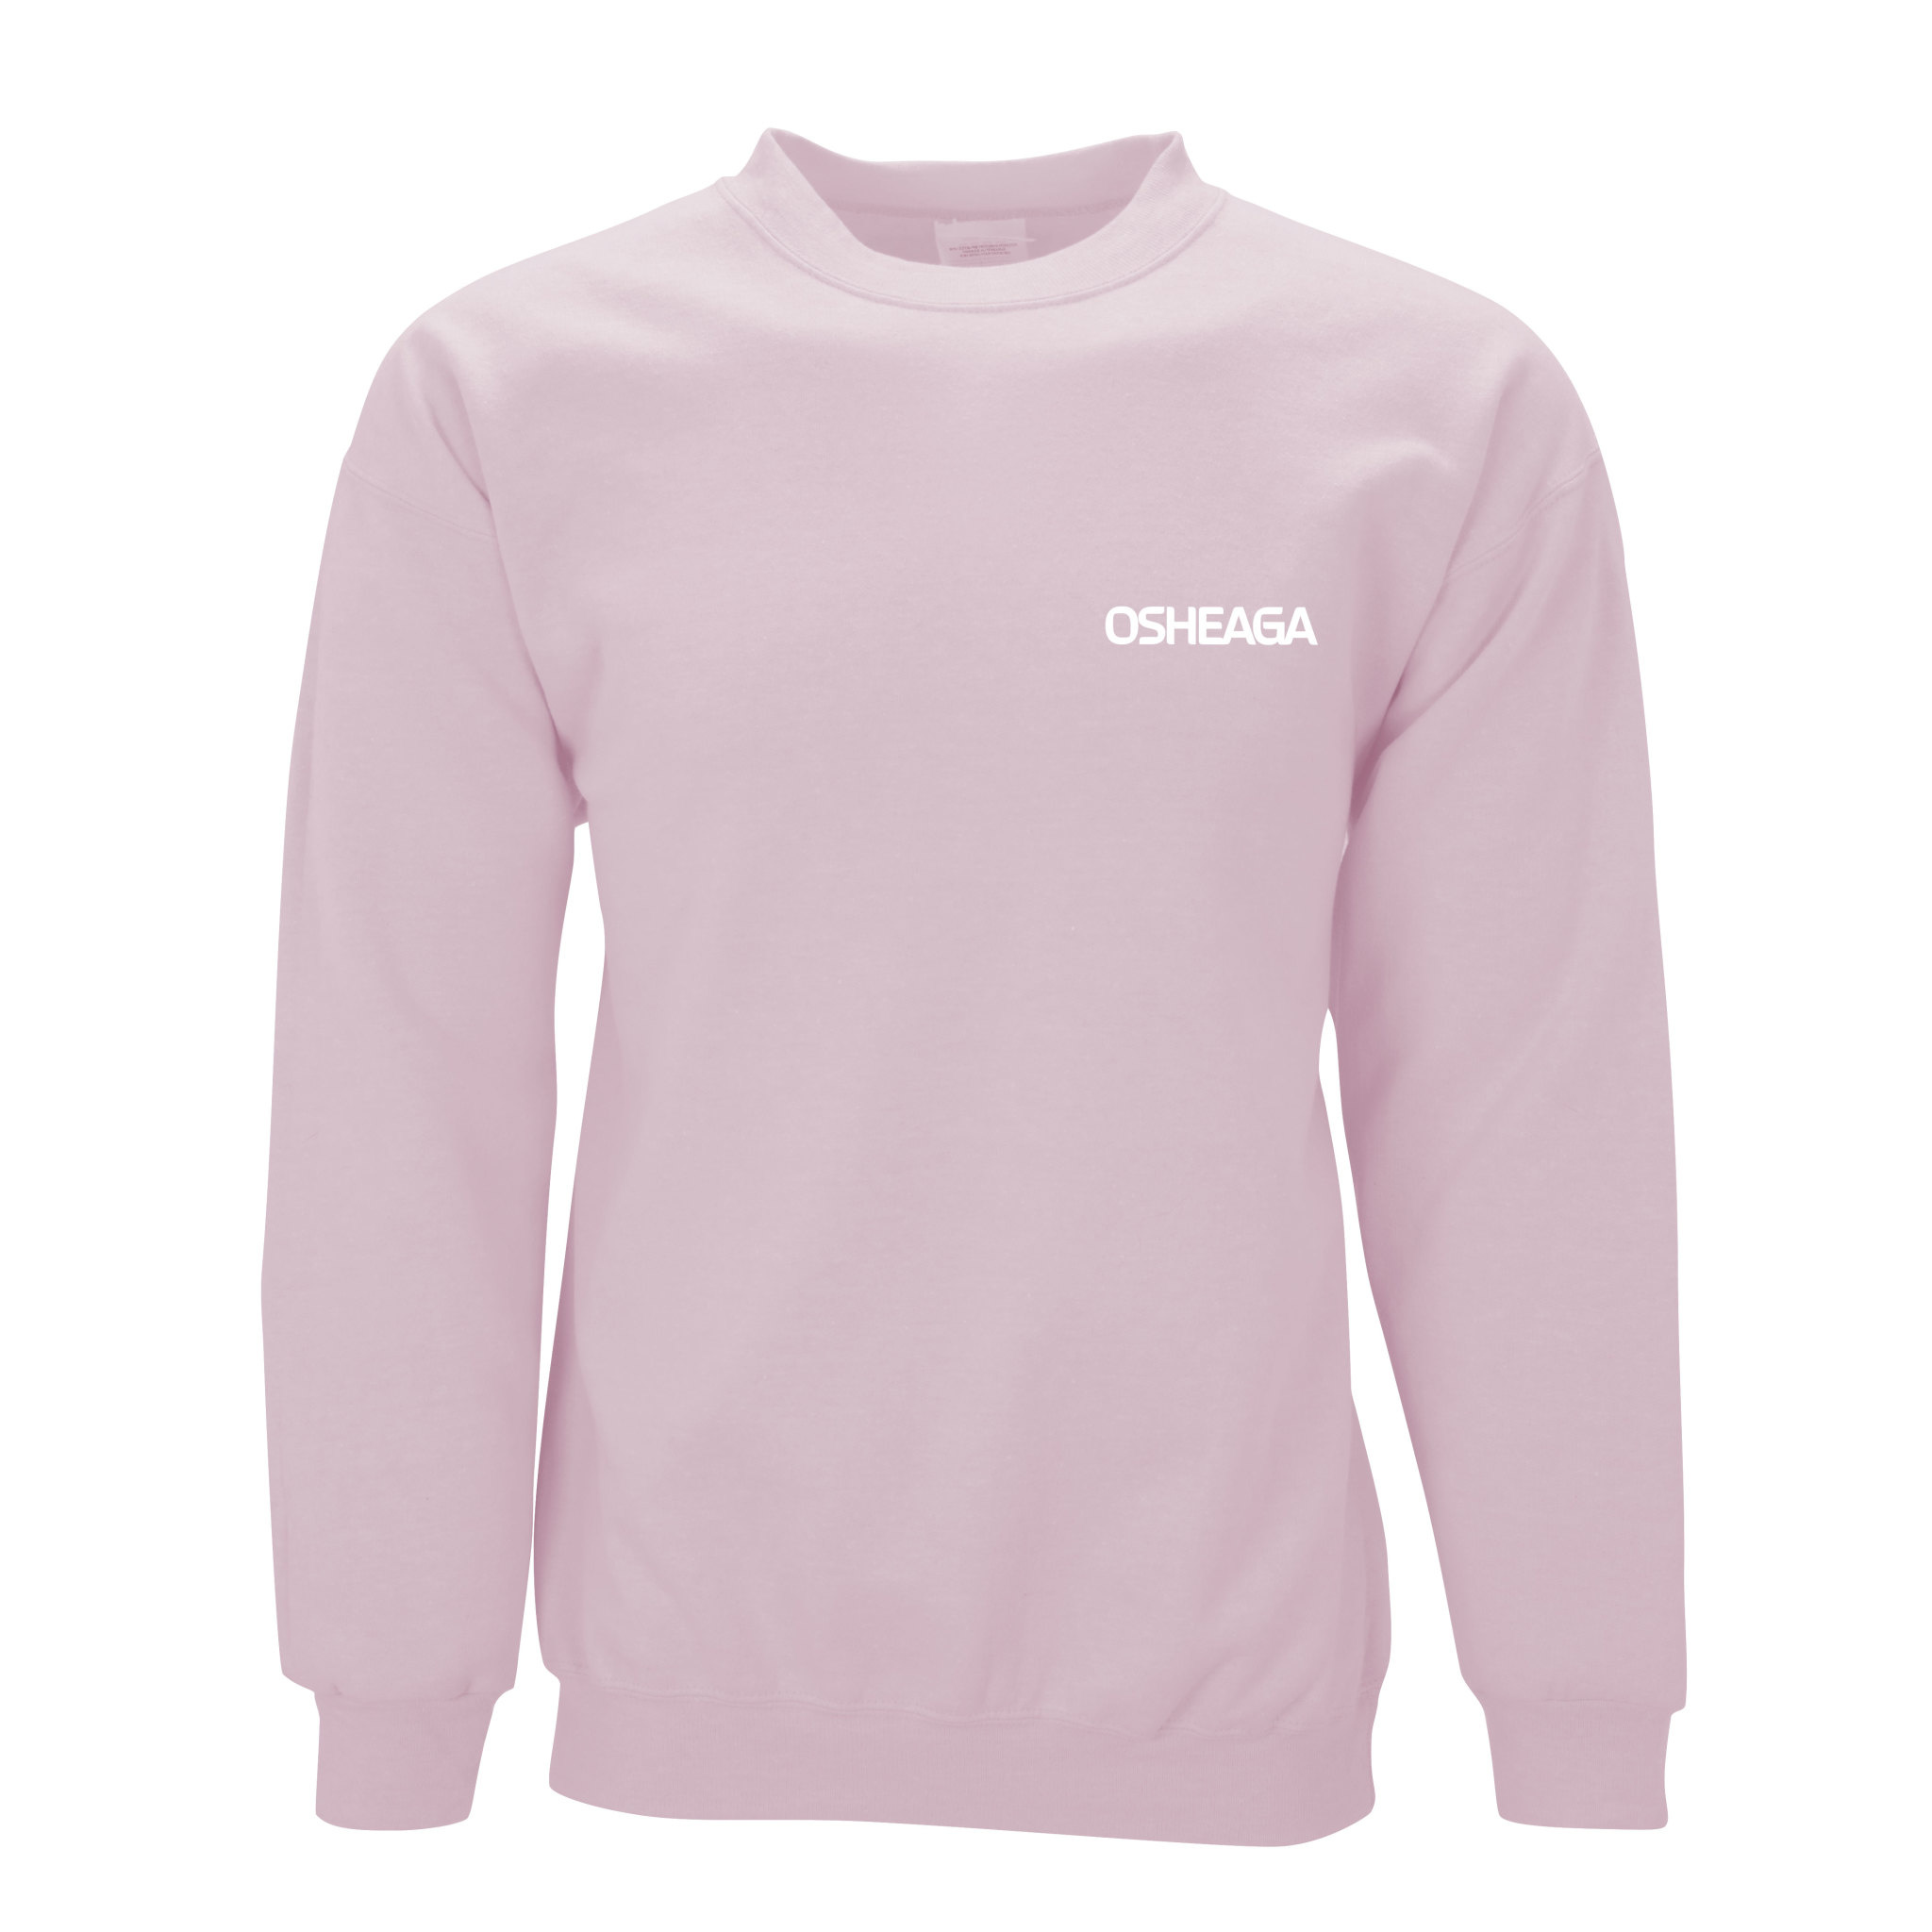 Unisex Osheaga Fluorescent pink Crew